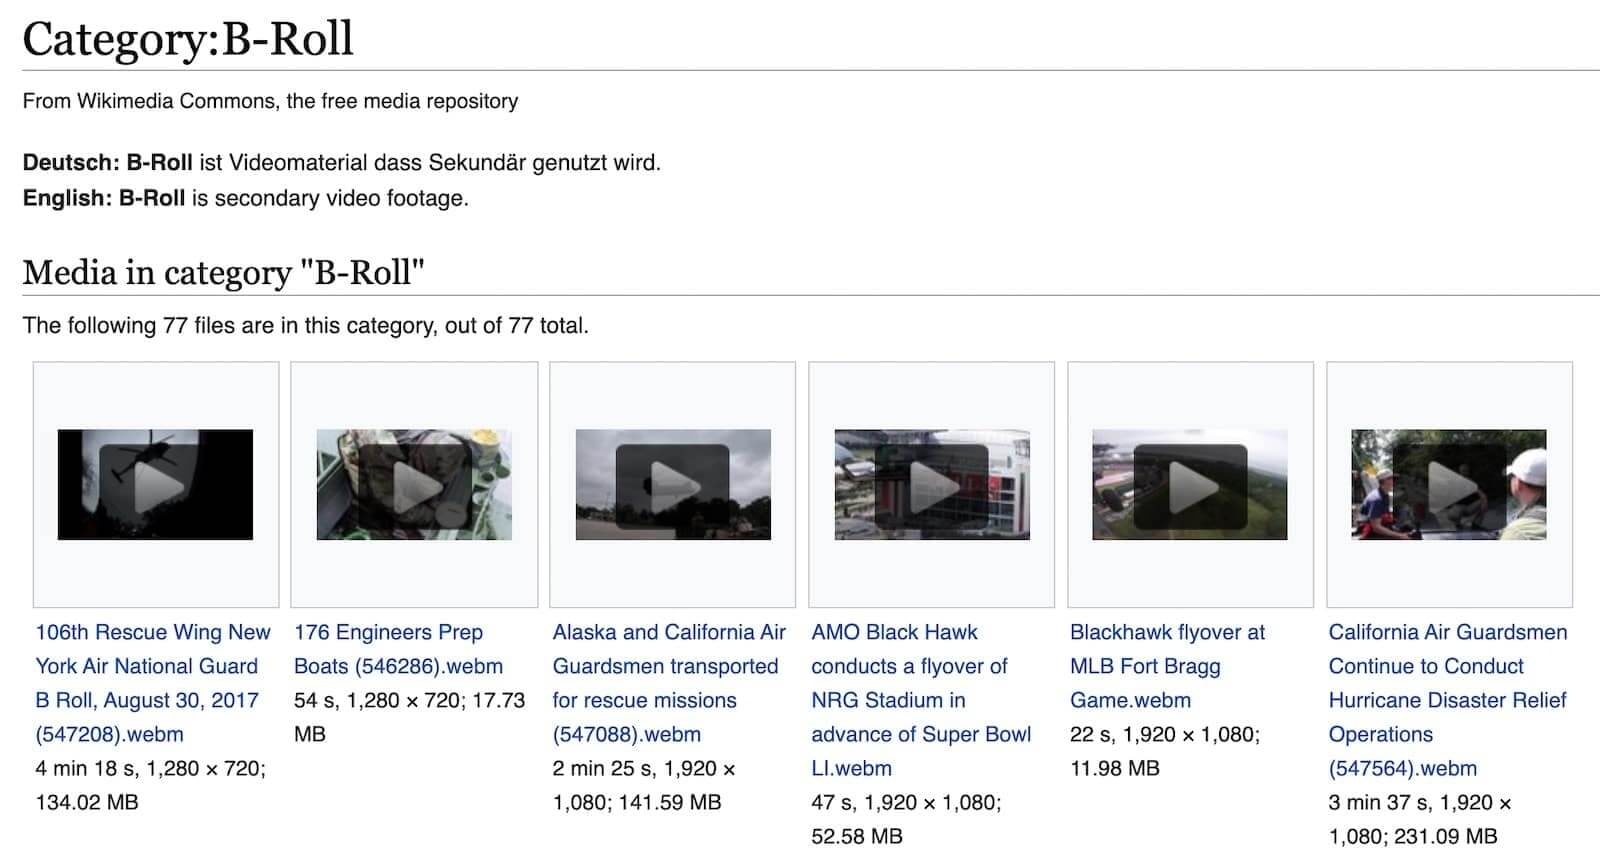 24 Websites to Find Affordable or Free B-Roll Footage - 1 - StudioBinder